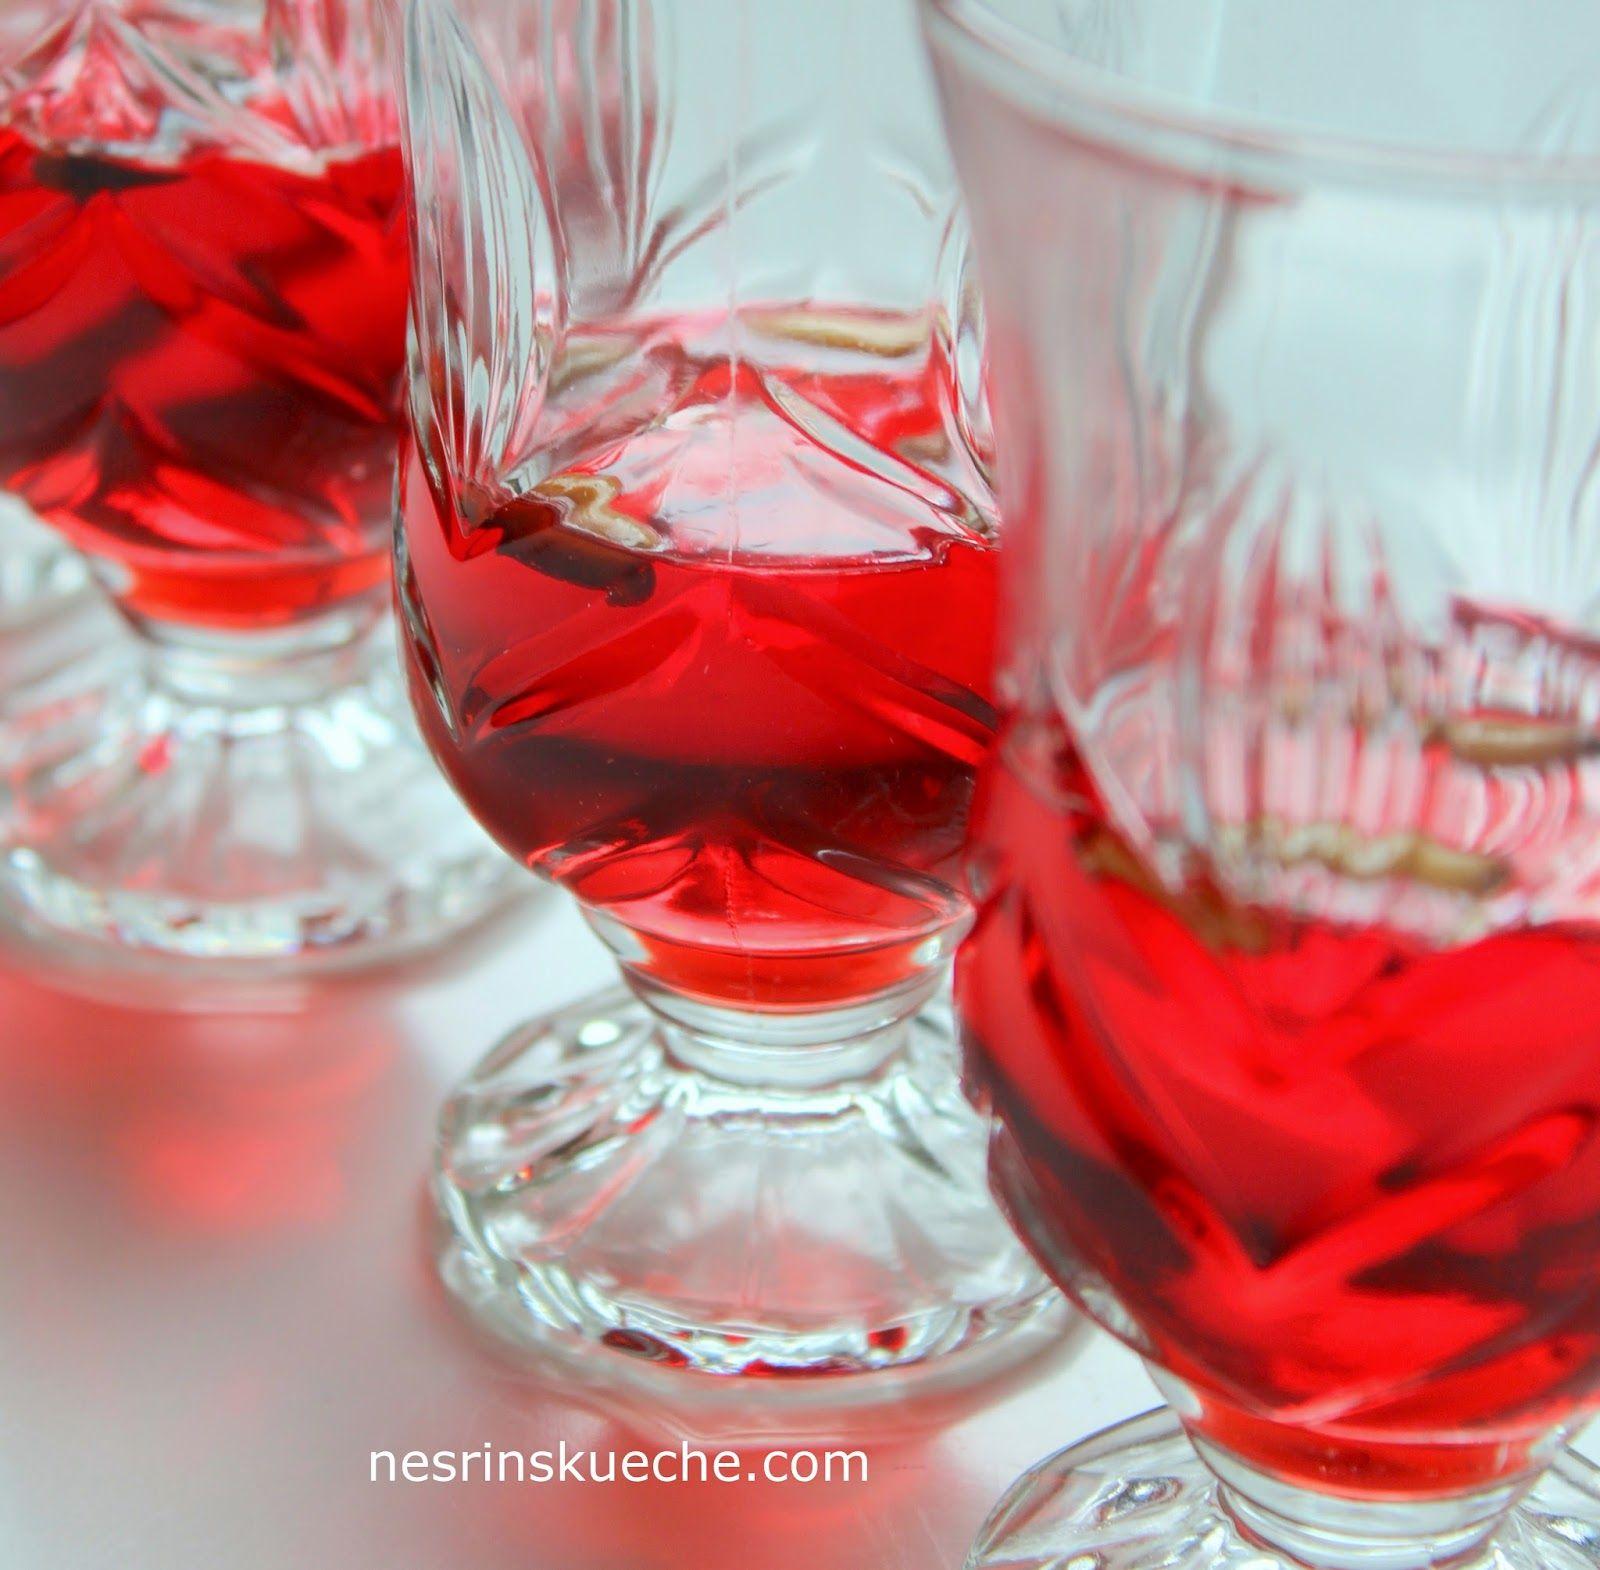 Lohusa Şerbeti / Wochenbett-Sirup-Getränke #recipe #spezialitaet ...